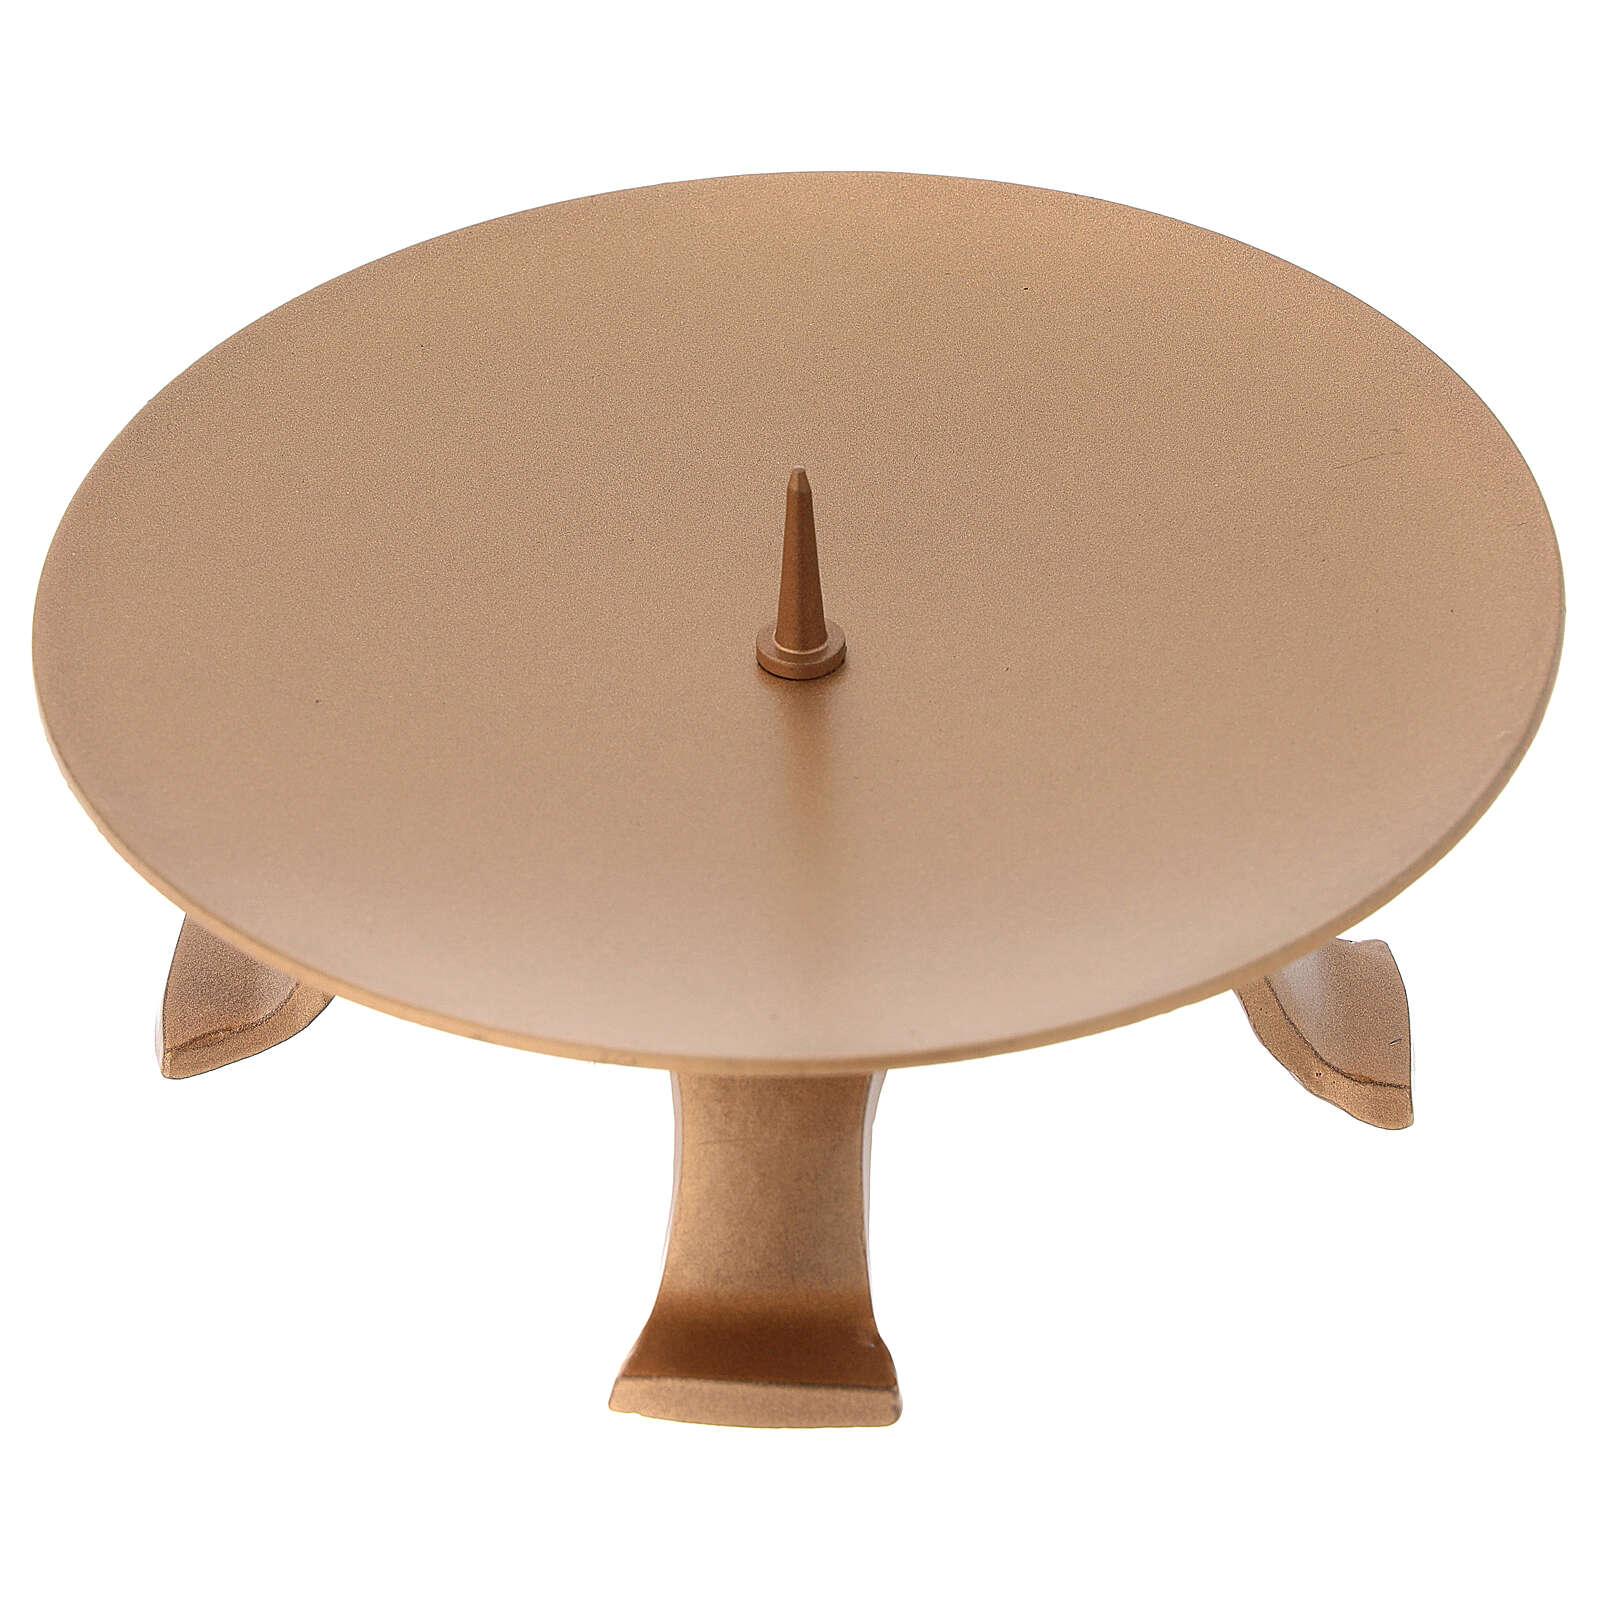 Portacandela diametro 13 cm ferro color oro piedini 4